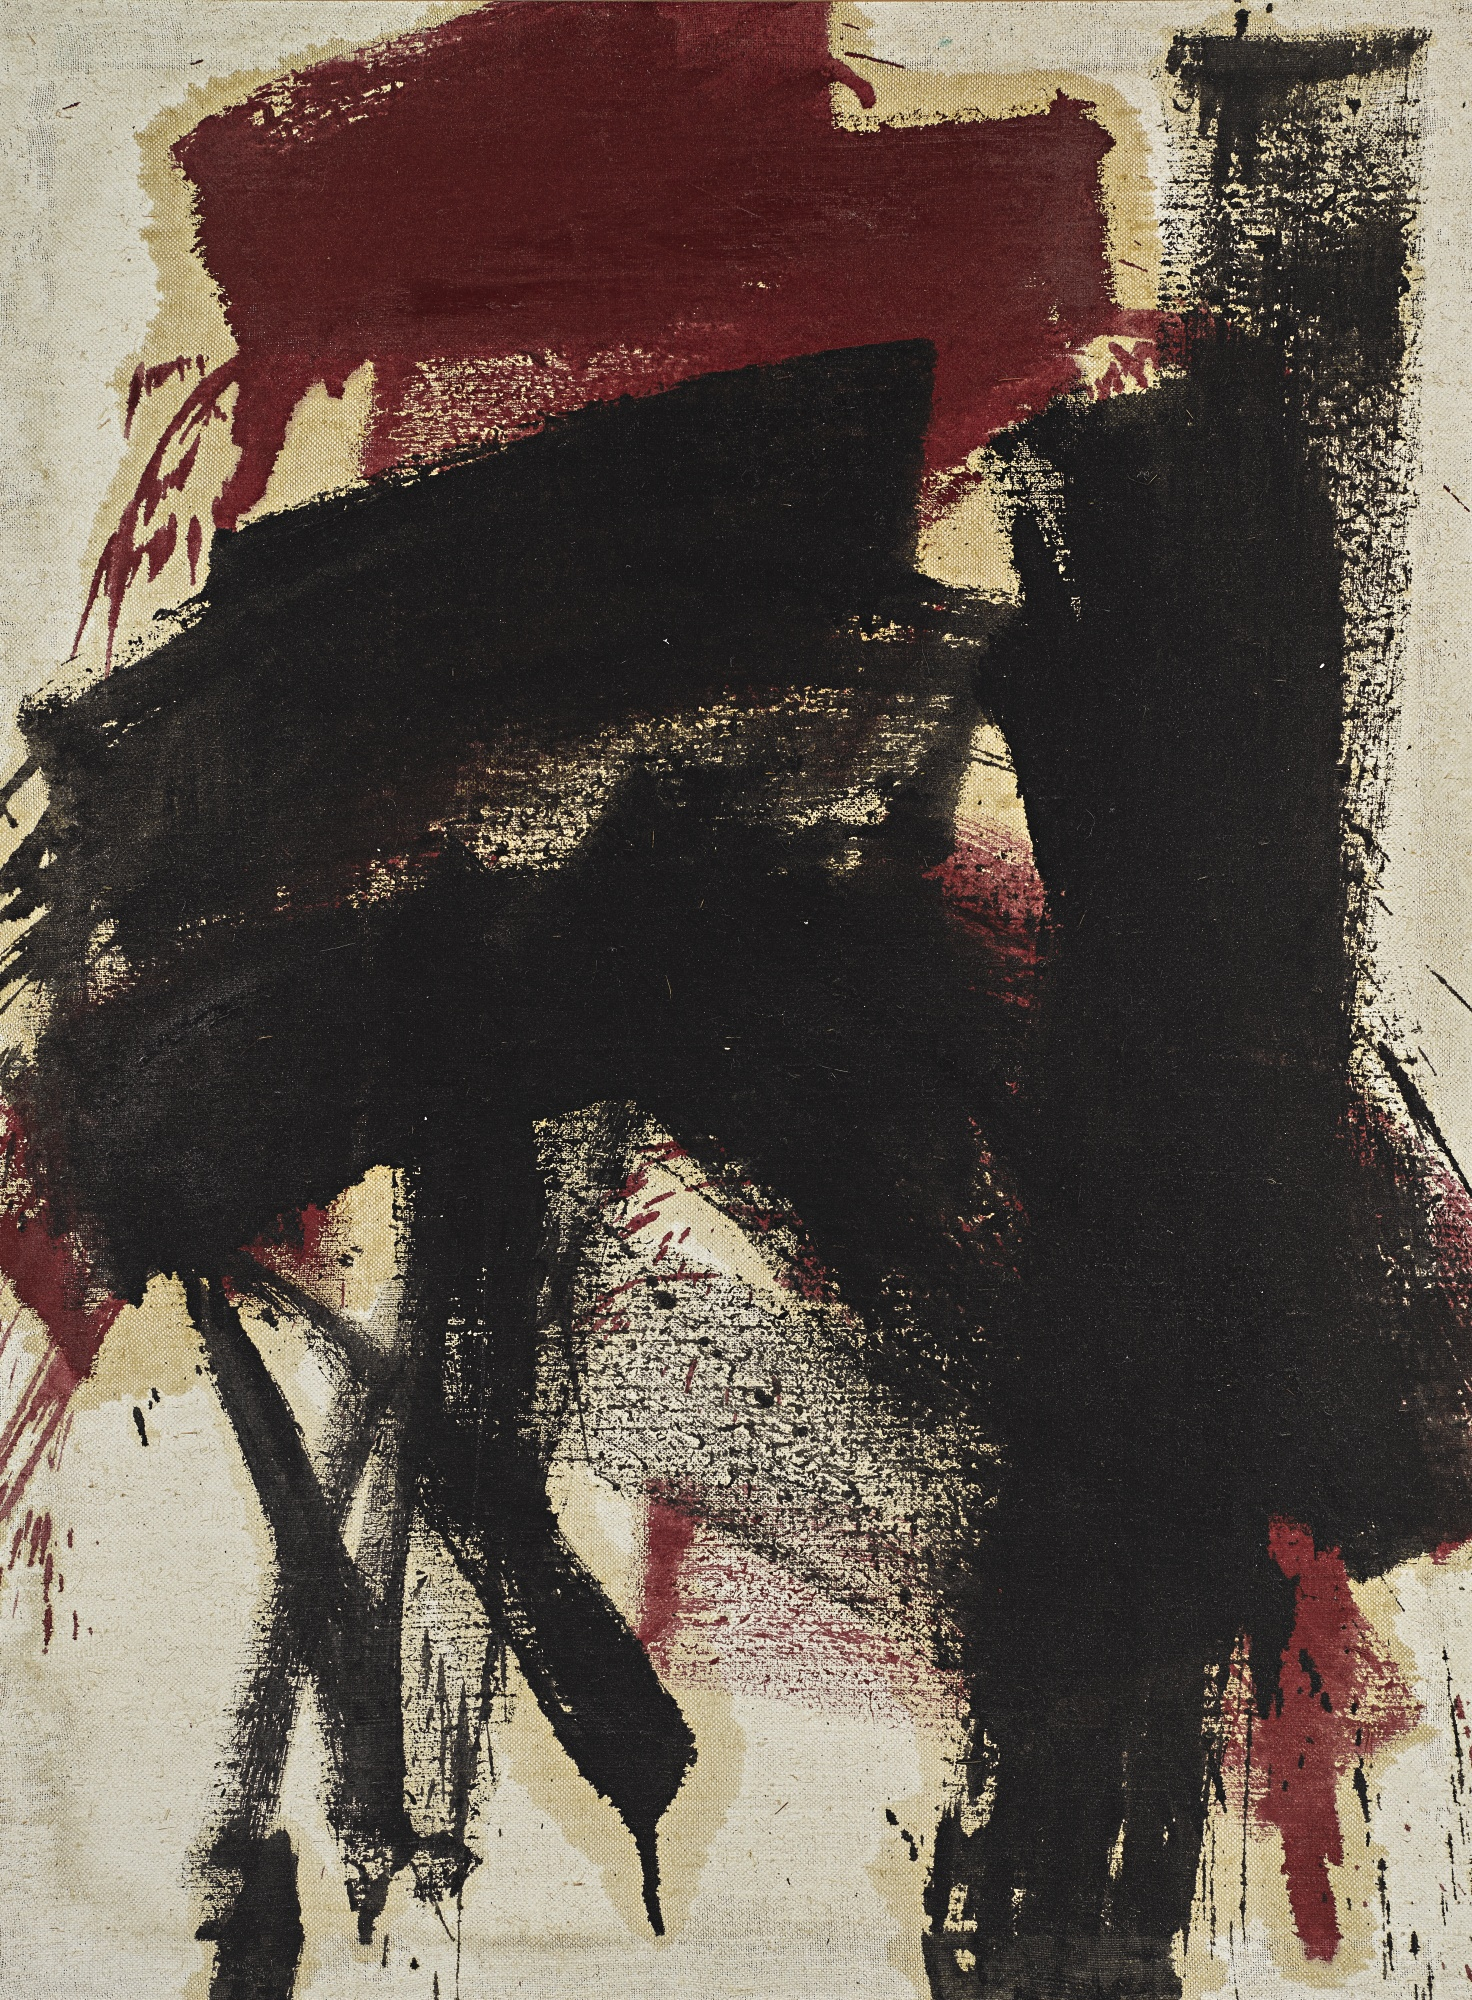 Zhu Jinshi-Untitled-1985